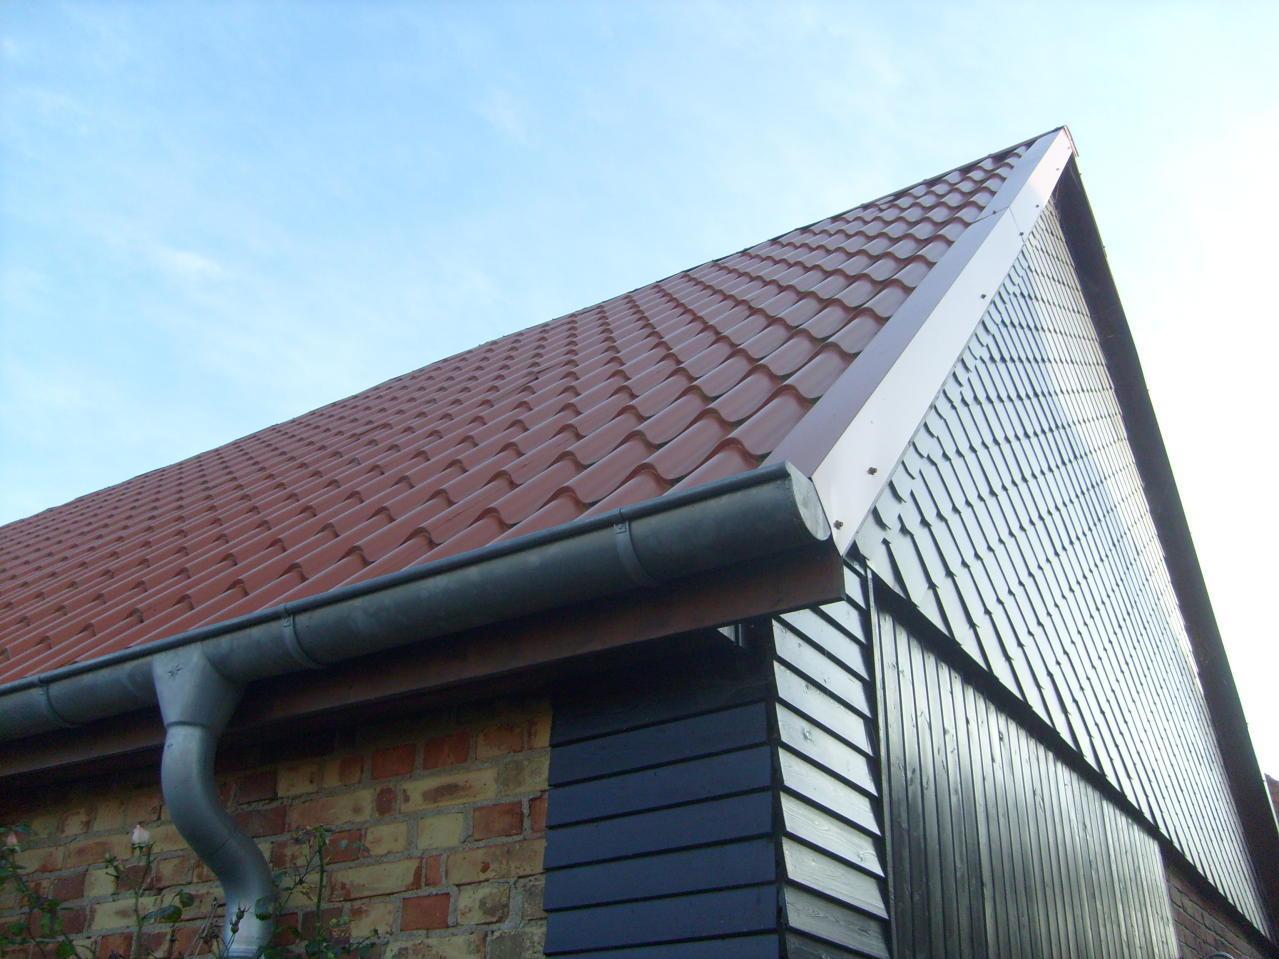 gartenhaus verschiedene dachformen gute auswahl tipp. Black Bedroom Furniture Sets. Home Design Ideas